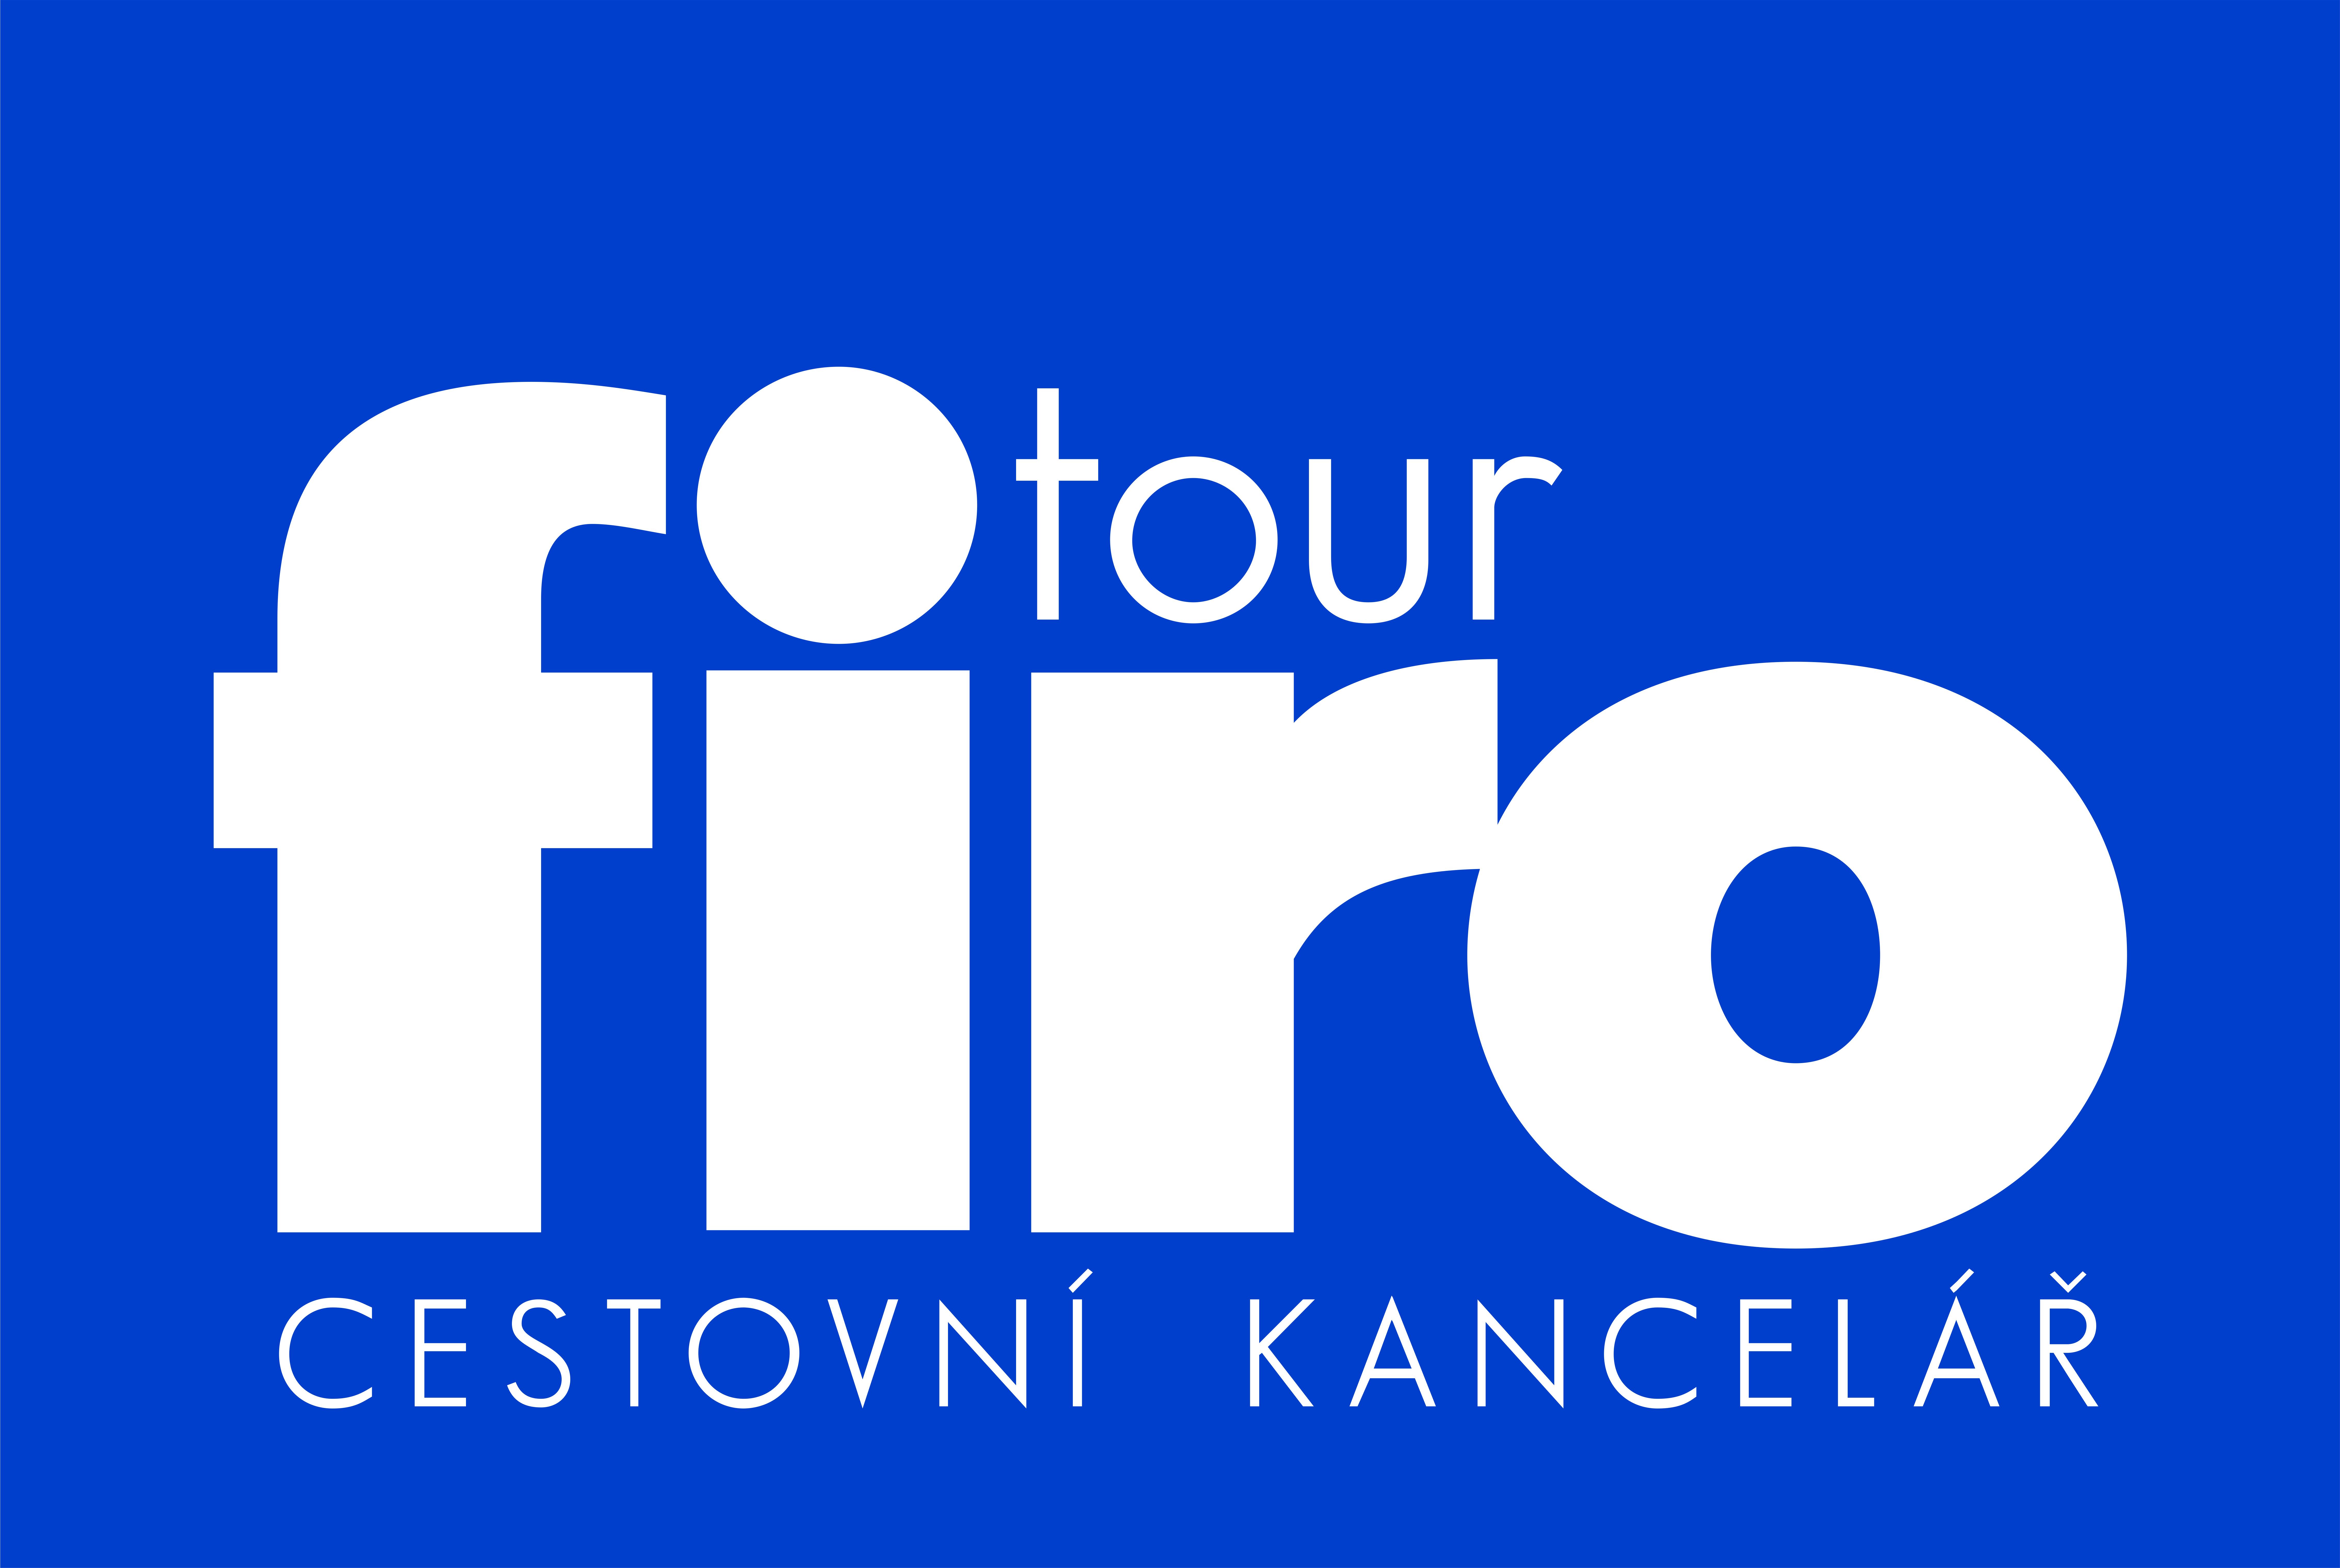 logo-cs_bila-podklad-modra